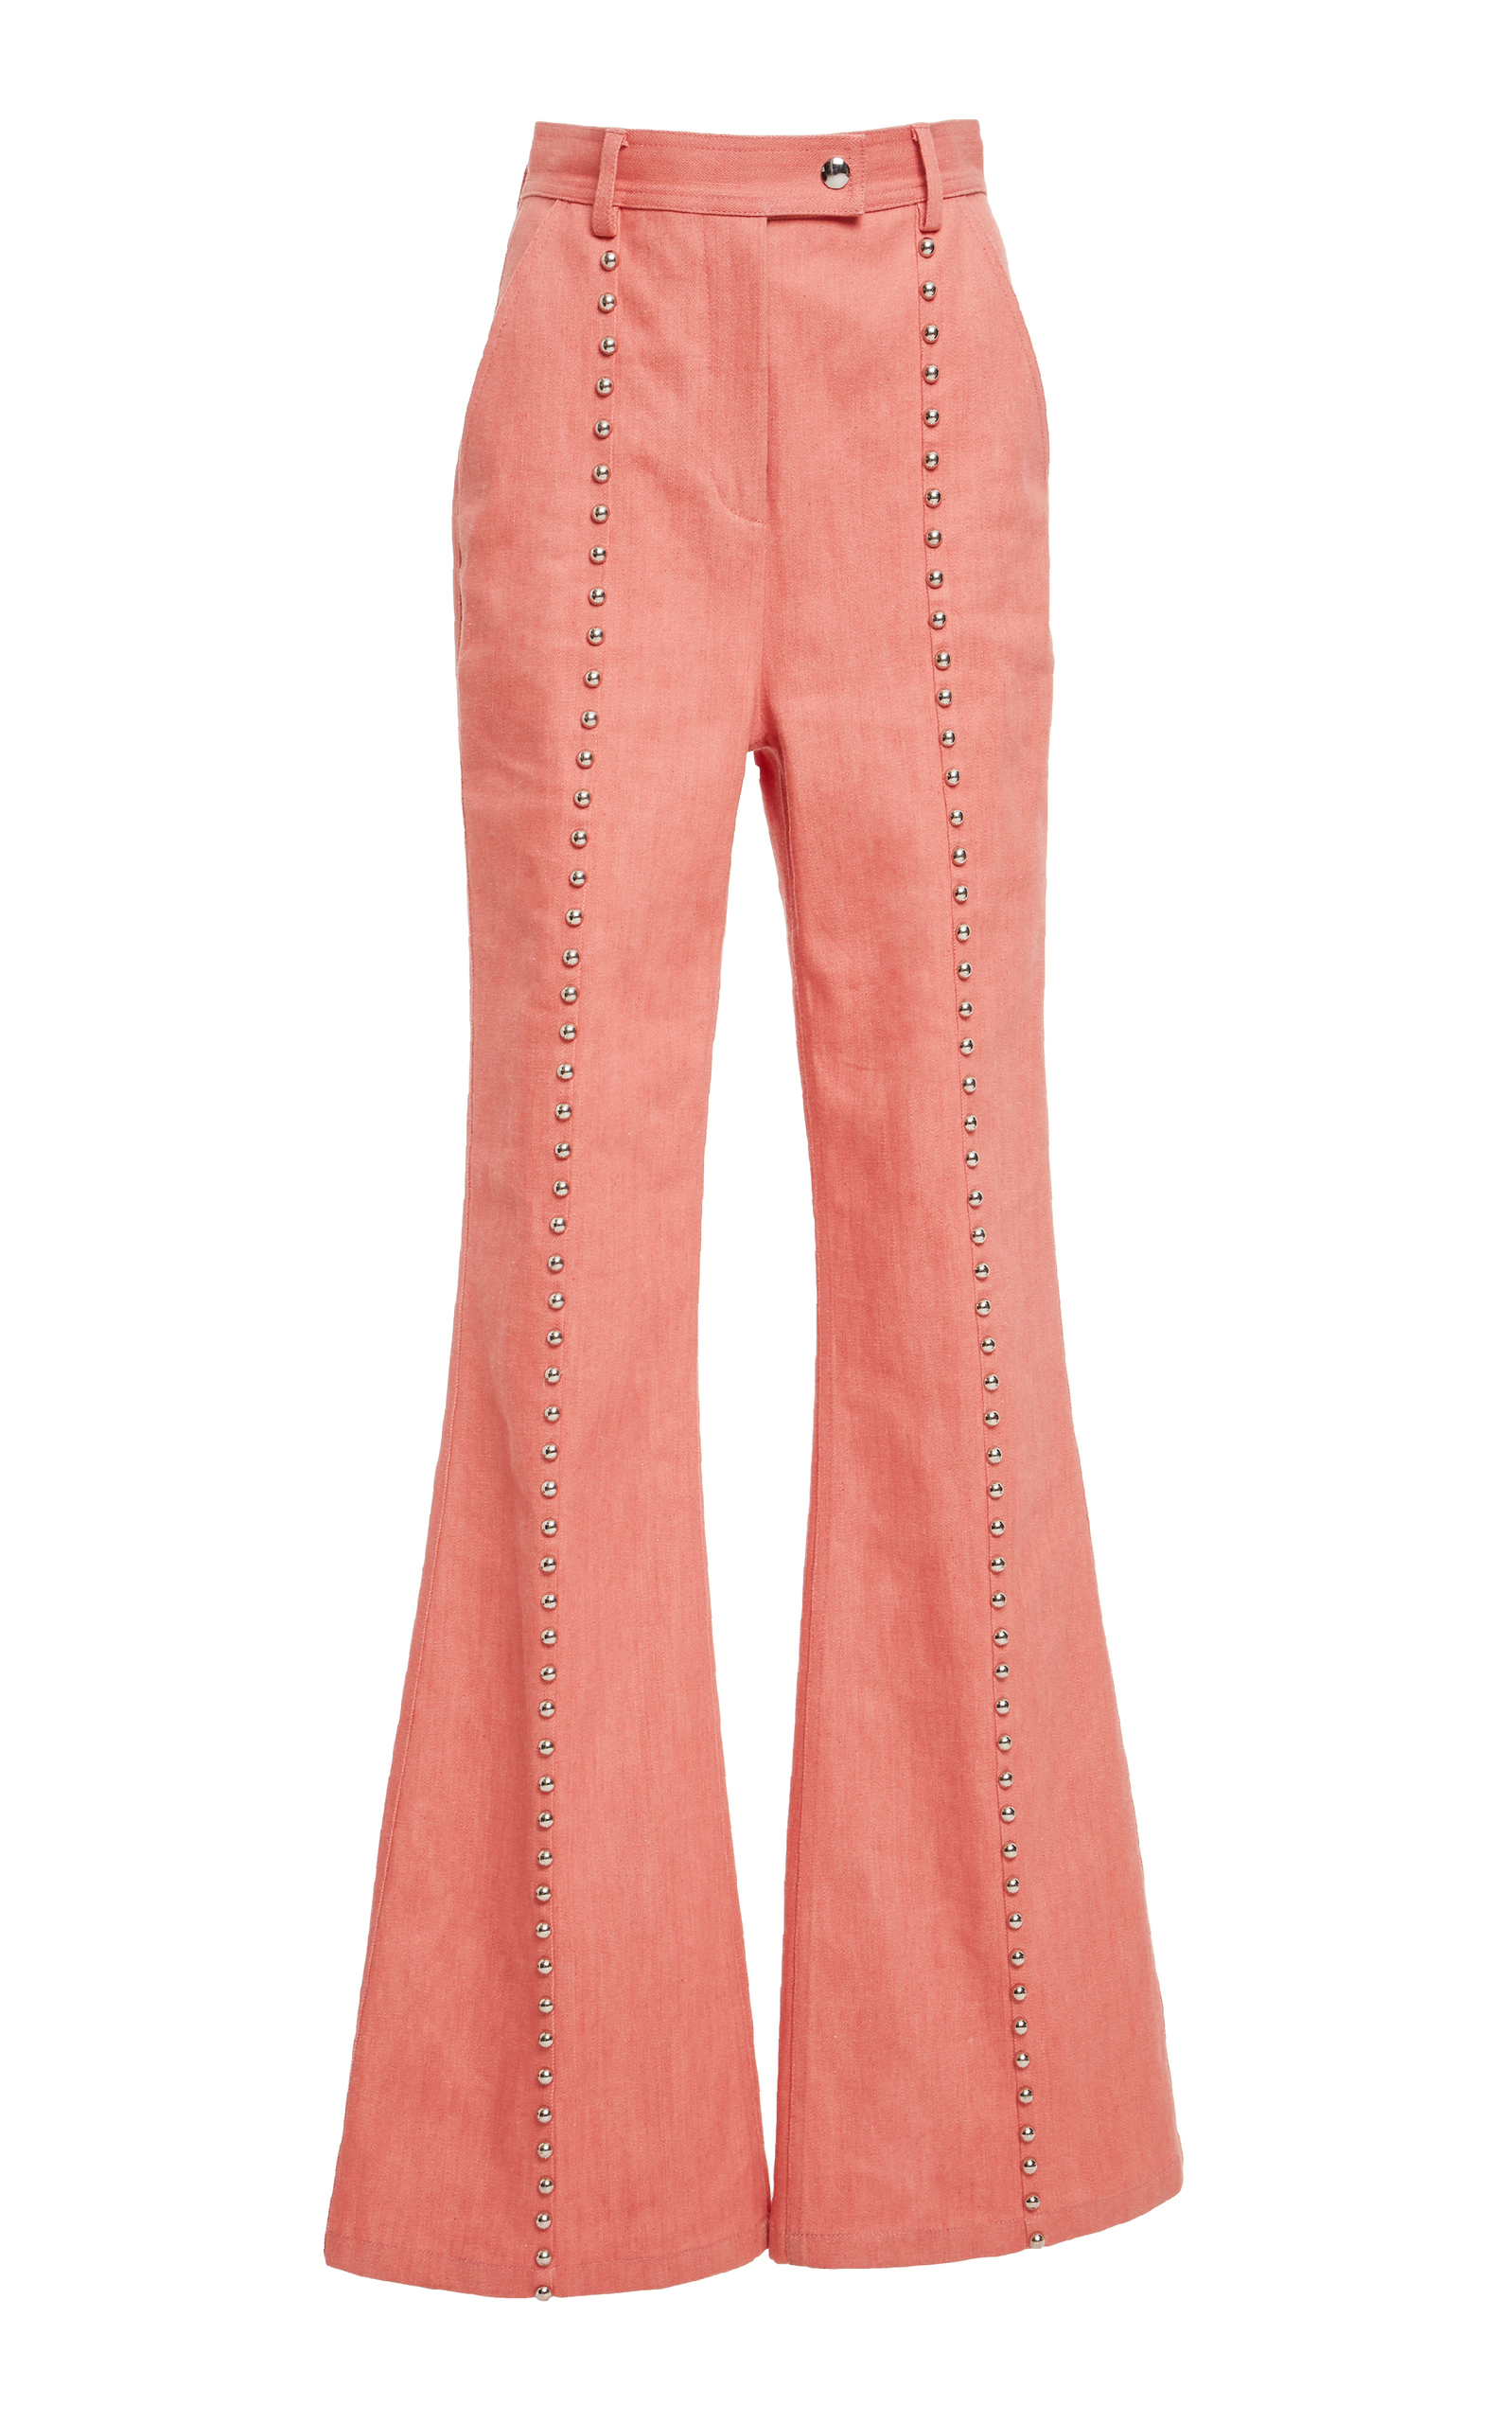 18272f7d Studded Seam Flare Pant